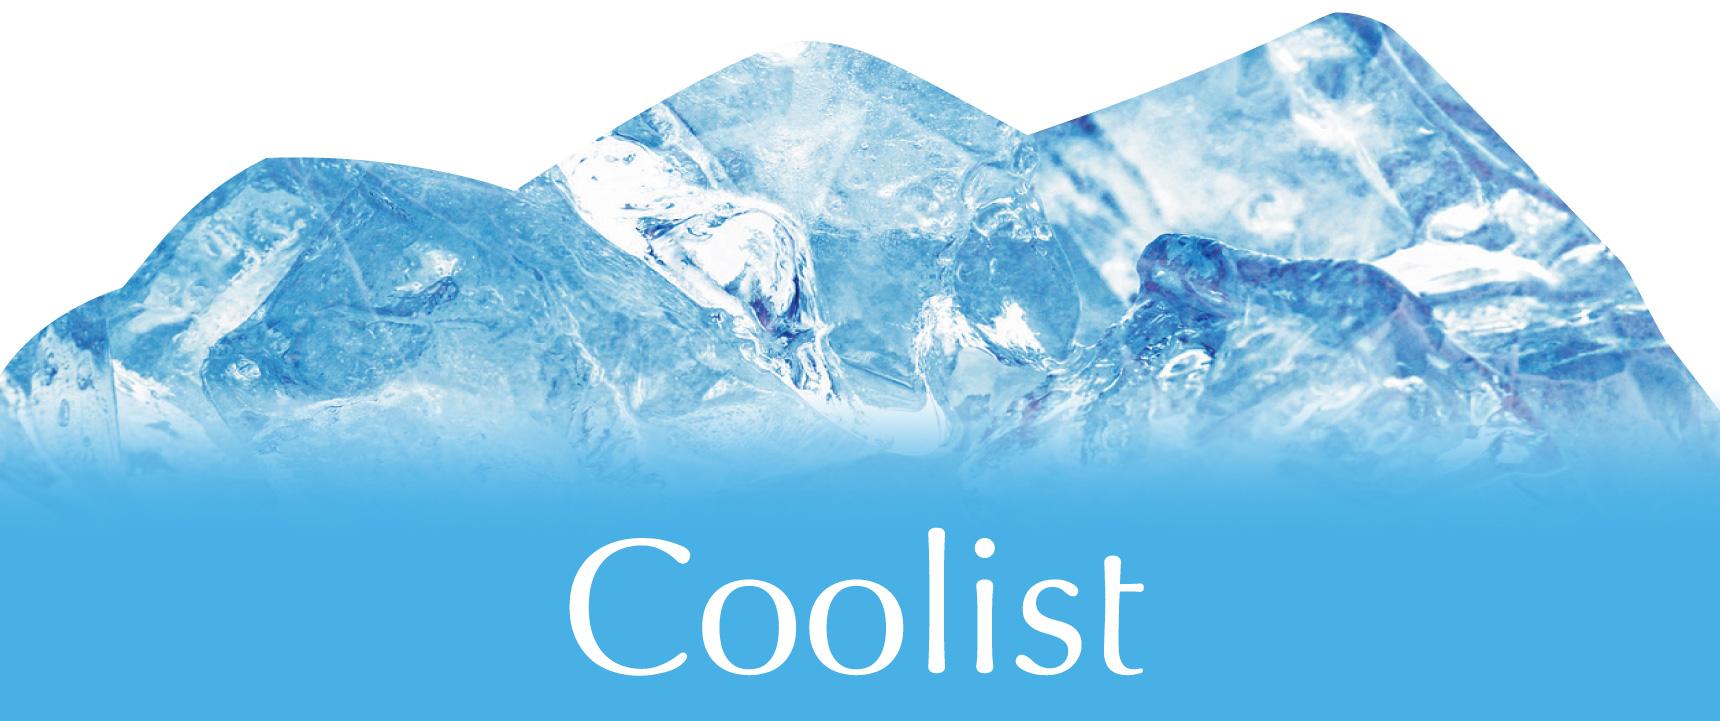 Coolist